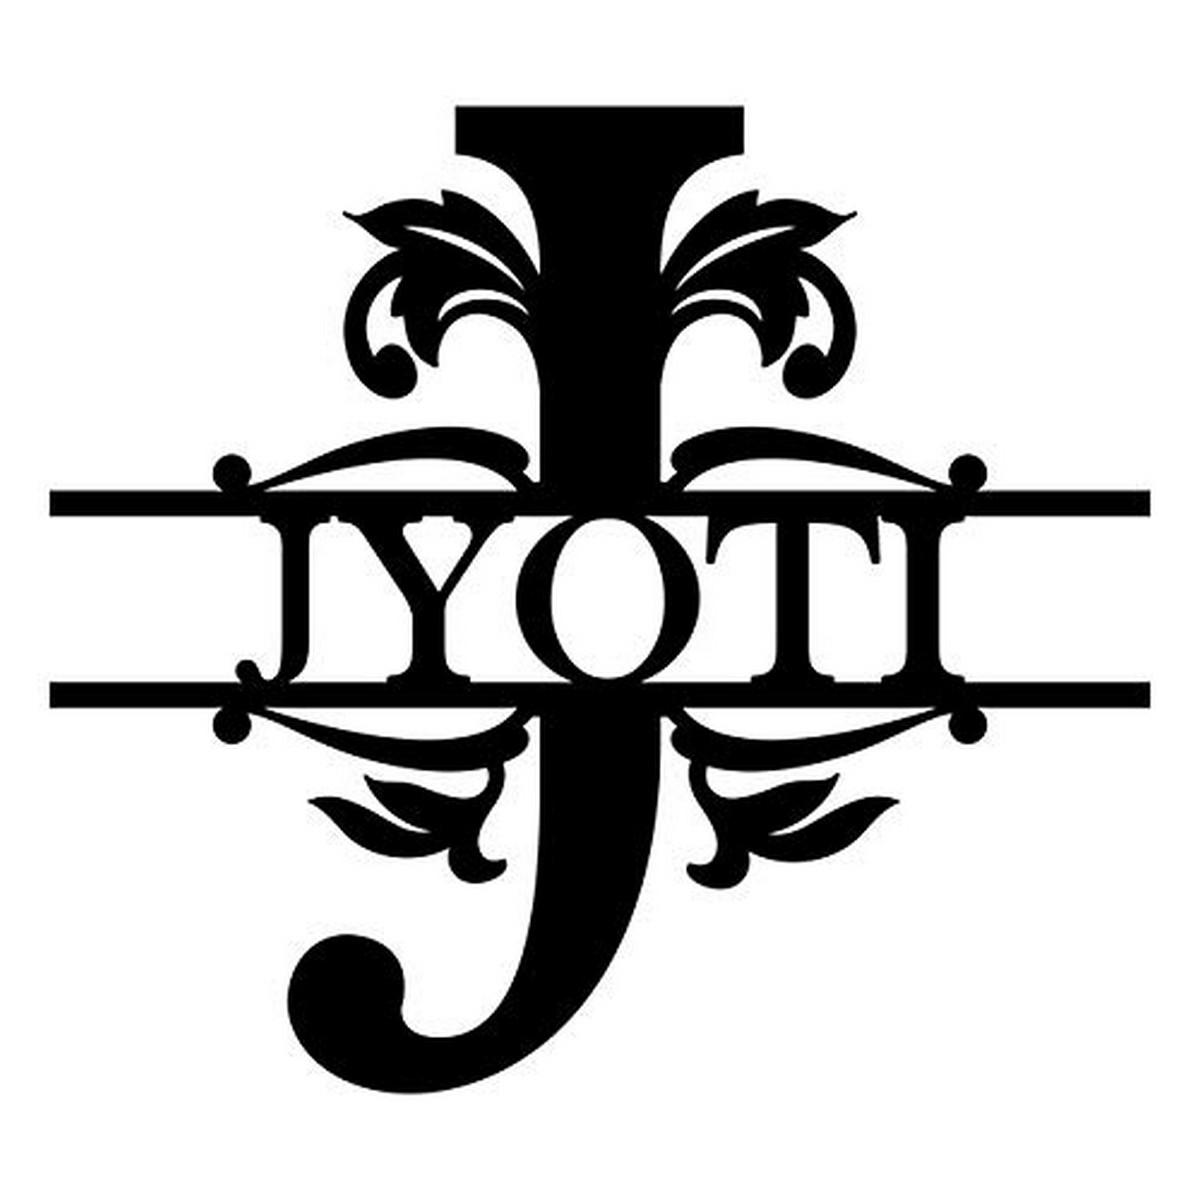 Personalized Monogram Wooden Alphabet  Monogram Wooden Alphabet 1